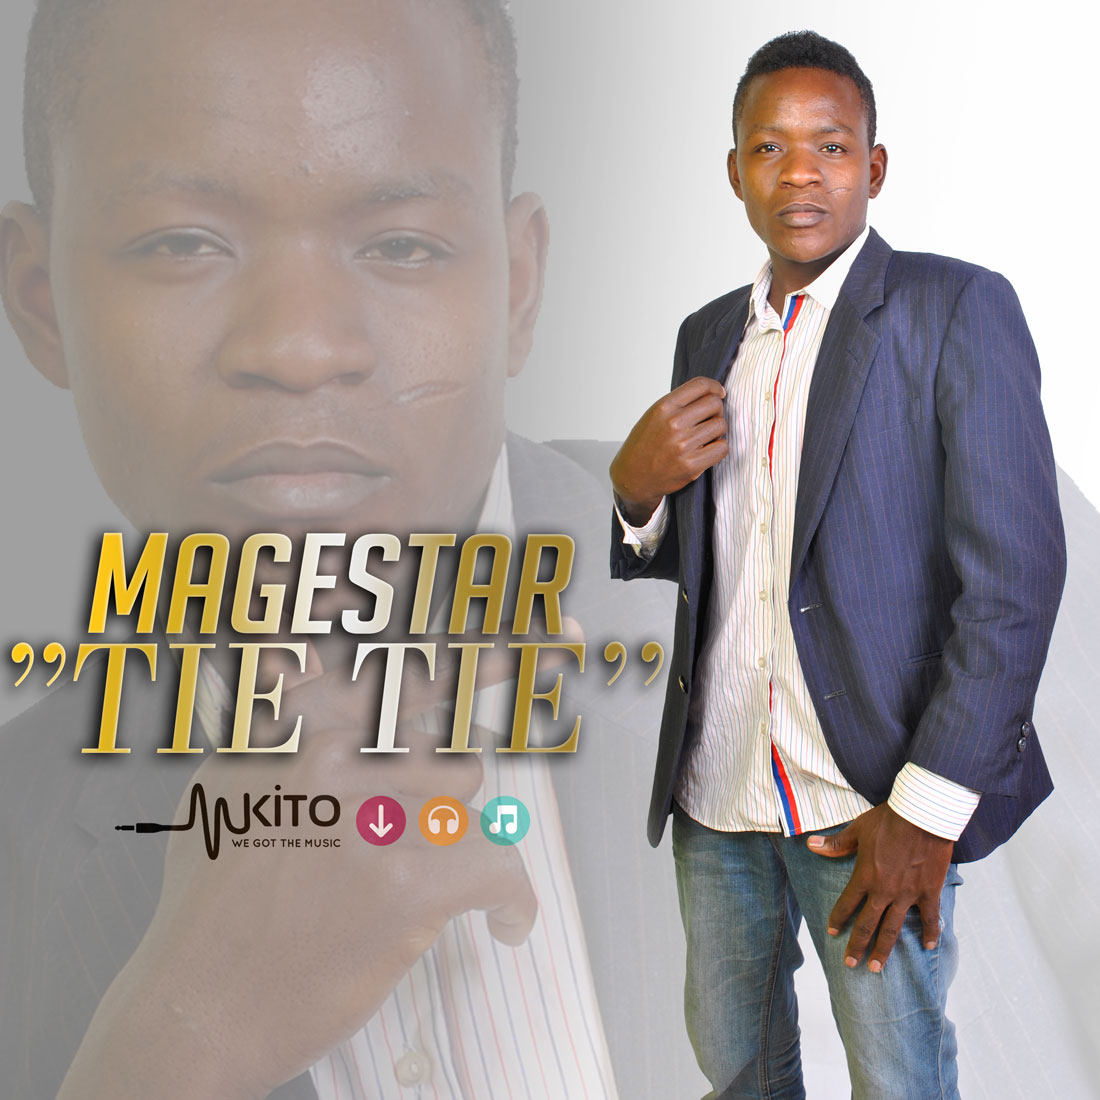 Magestar - Magestar-Tie Tie (Mix)